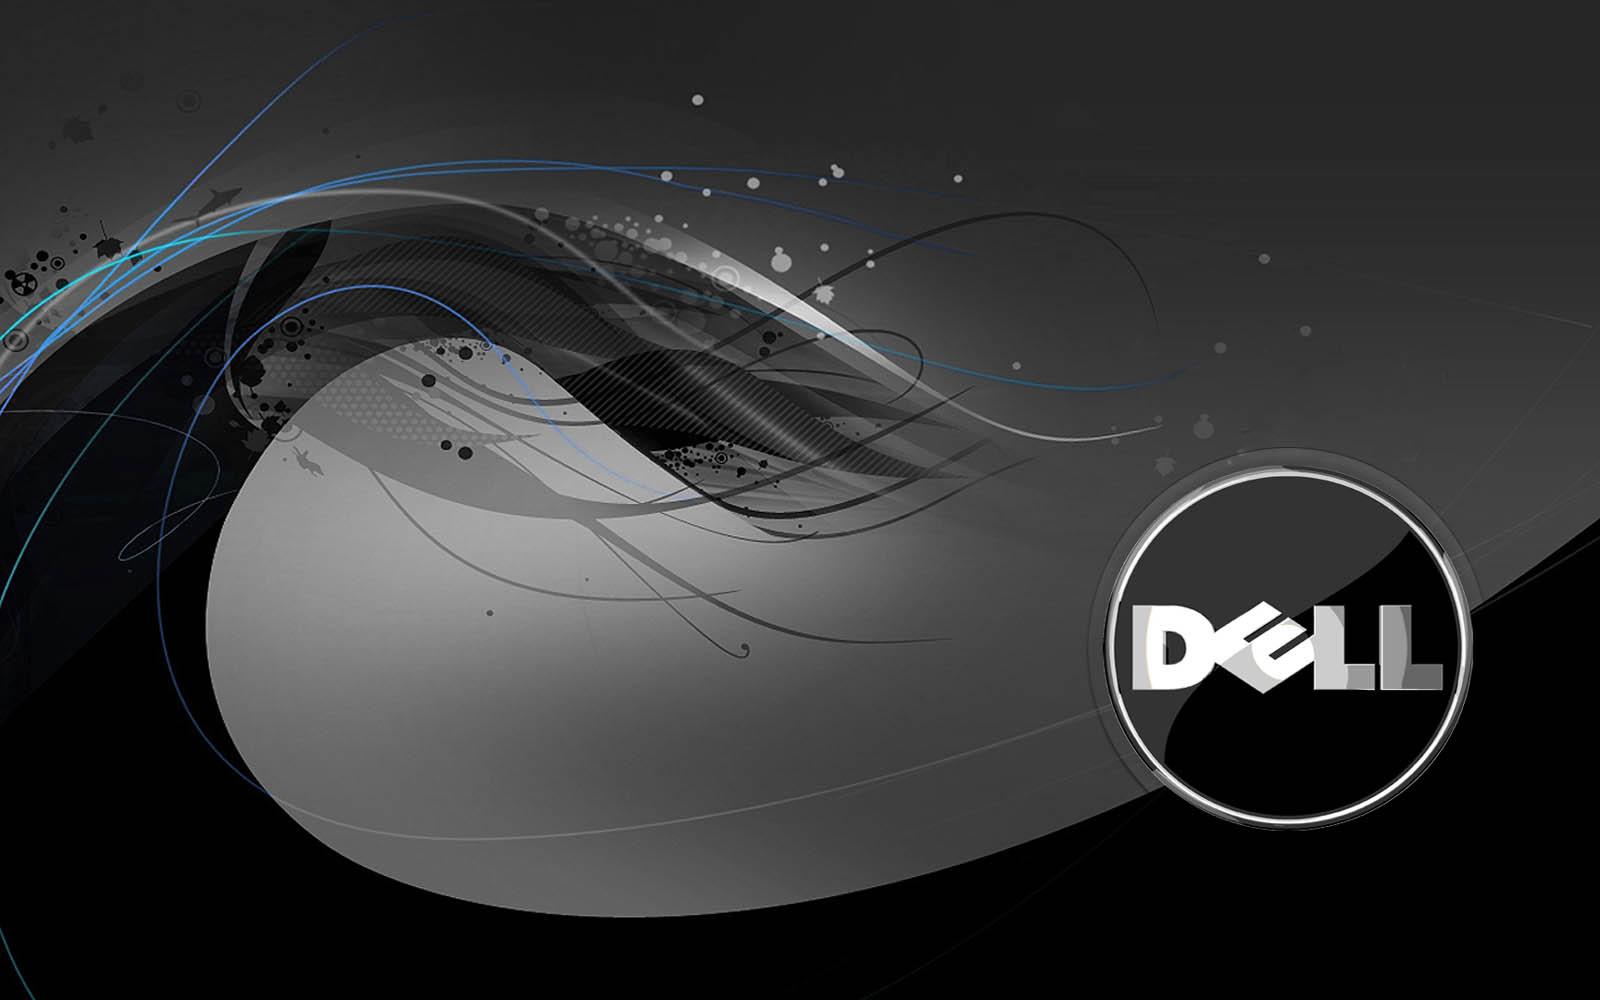 20+] Dell Wallpaper Windows 20 on WallpaperSafari